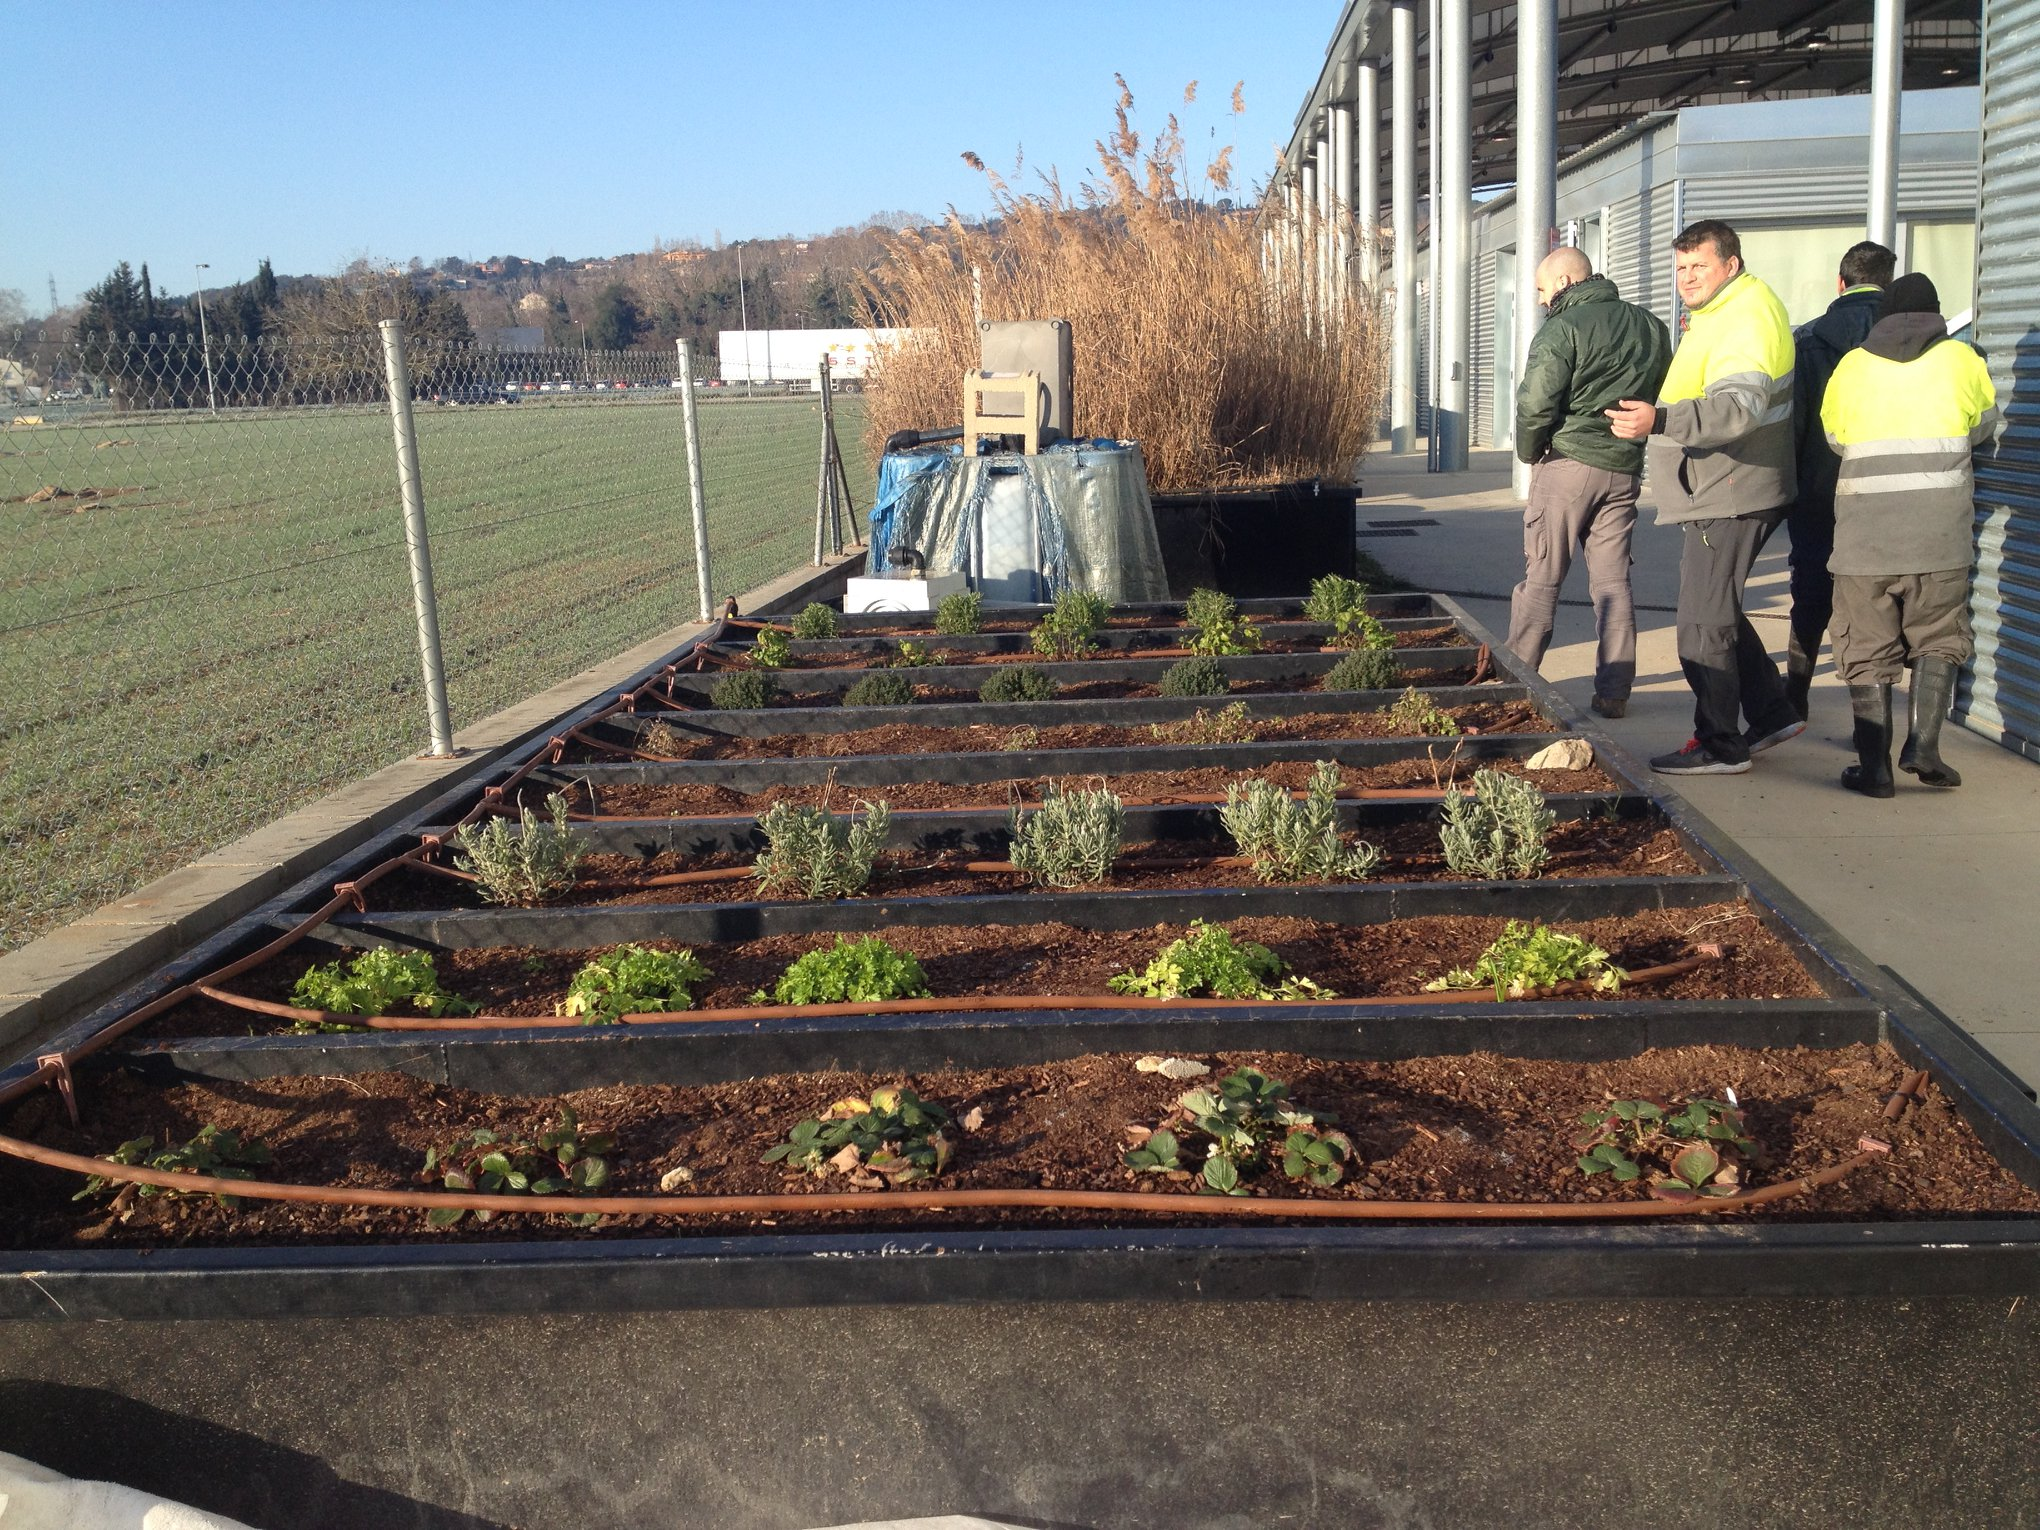 installation irrigation goutte goutte l 39 eau les herbes grup fundaci ramon noguera. Black Bedroom Furniture Sets. Home Design Ideas